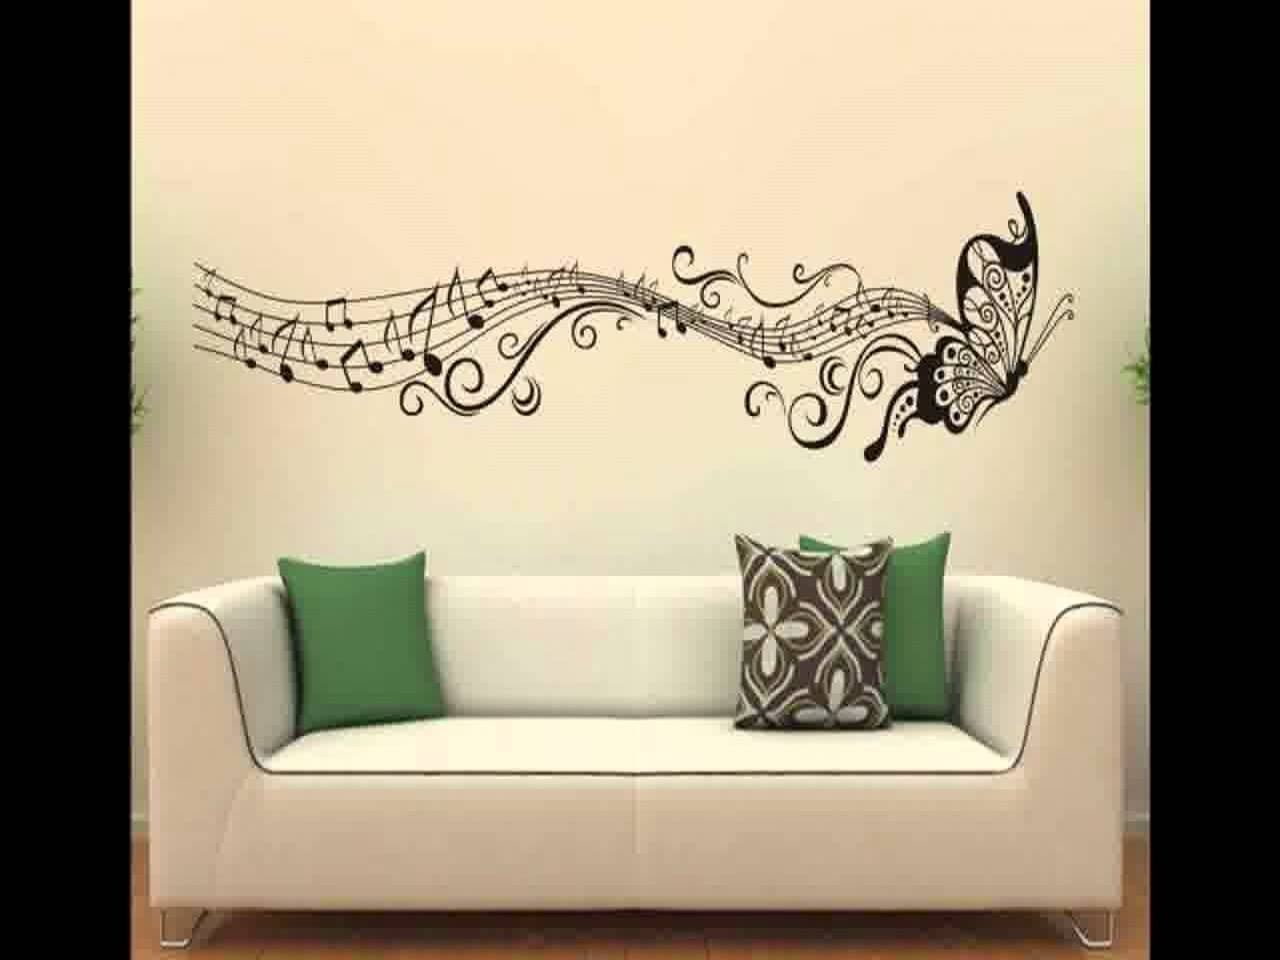 Fashionable Acrylic Wall Art Design Ideas – Youtube For Acrylic Wall Art (View 6 of 15)